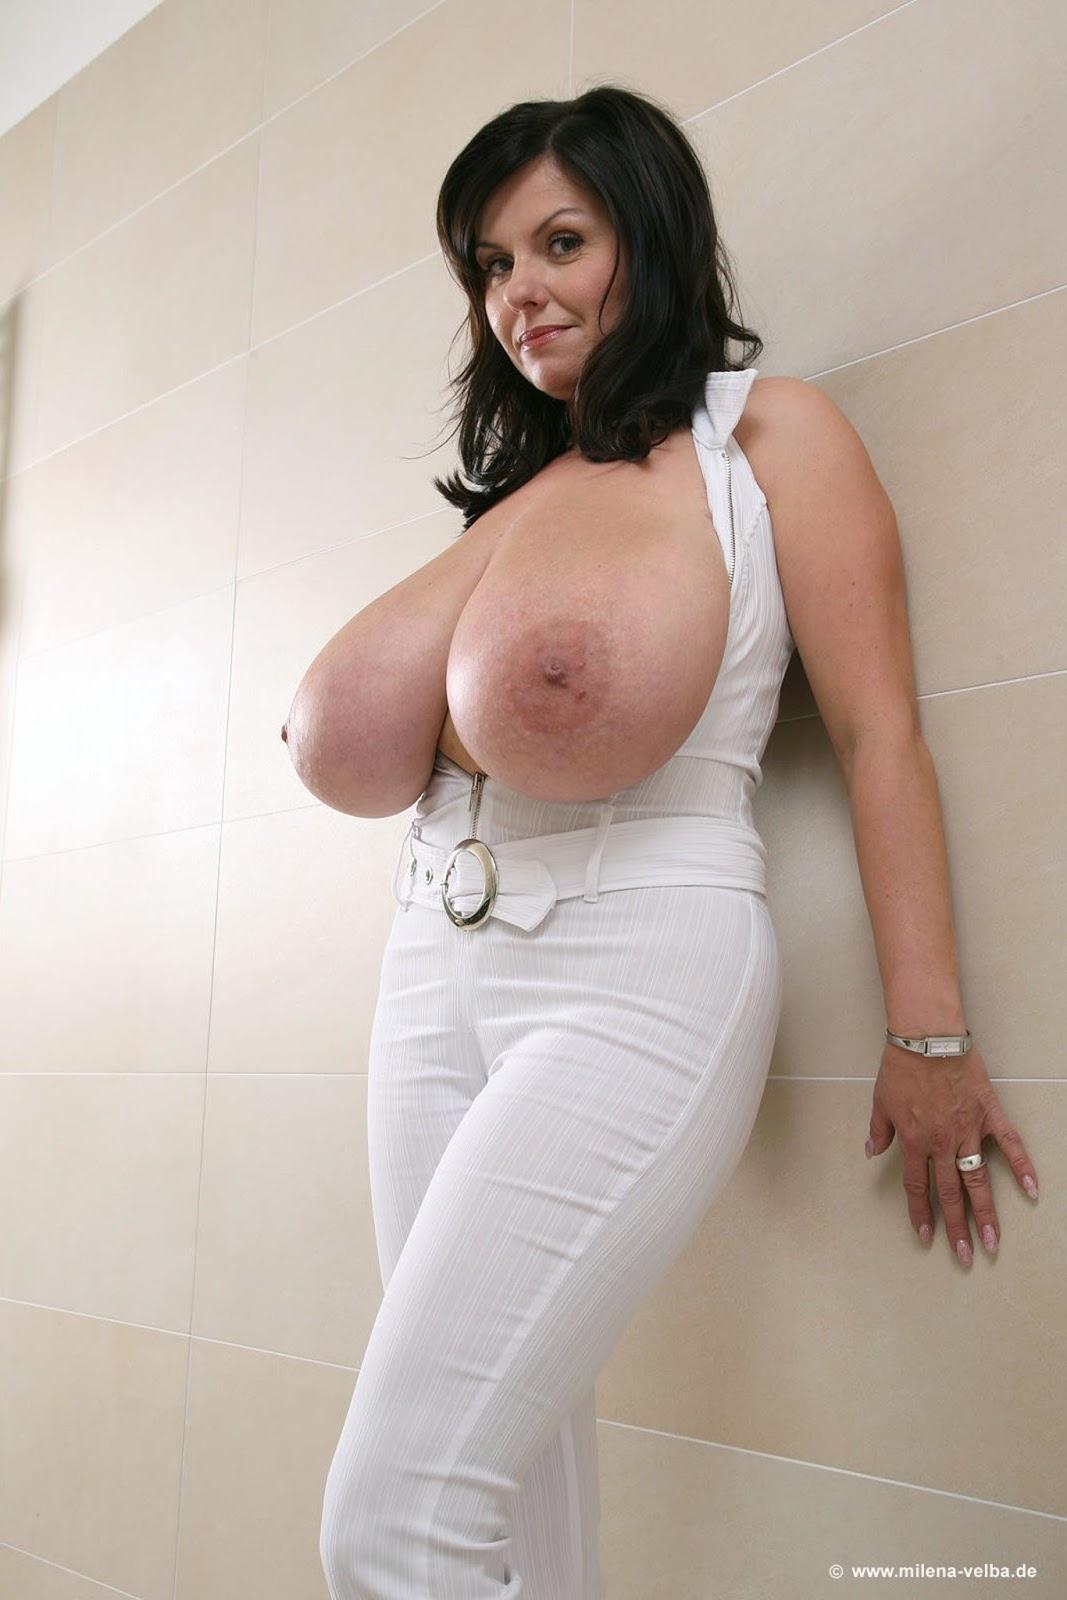 sexy dick of nude boys inside girl